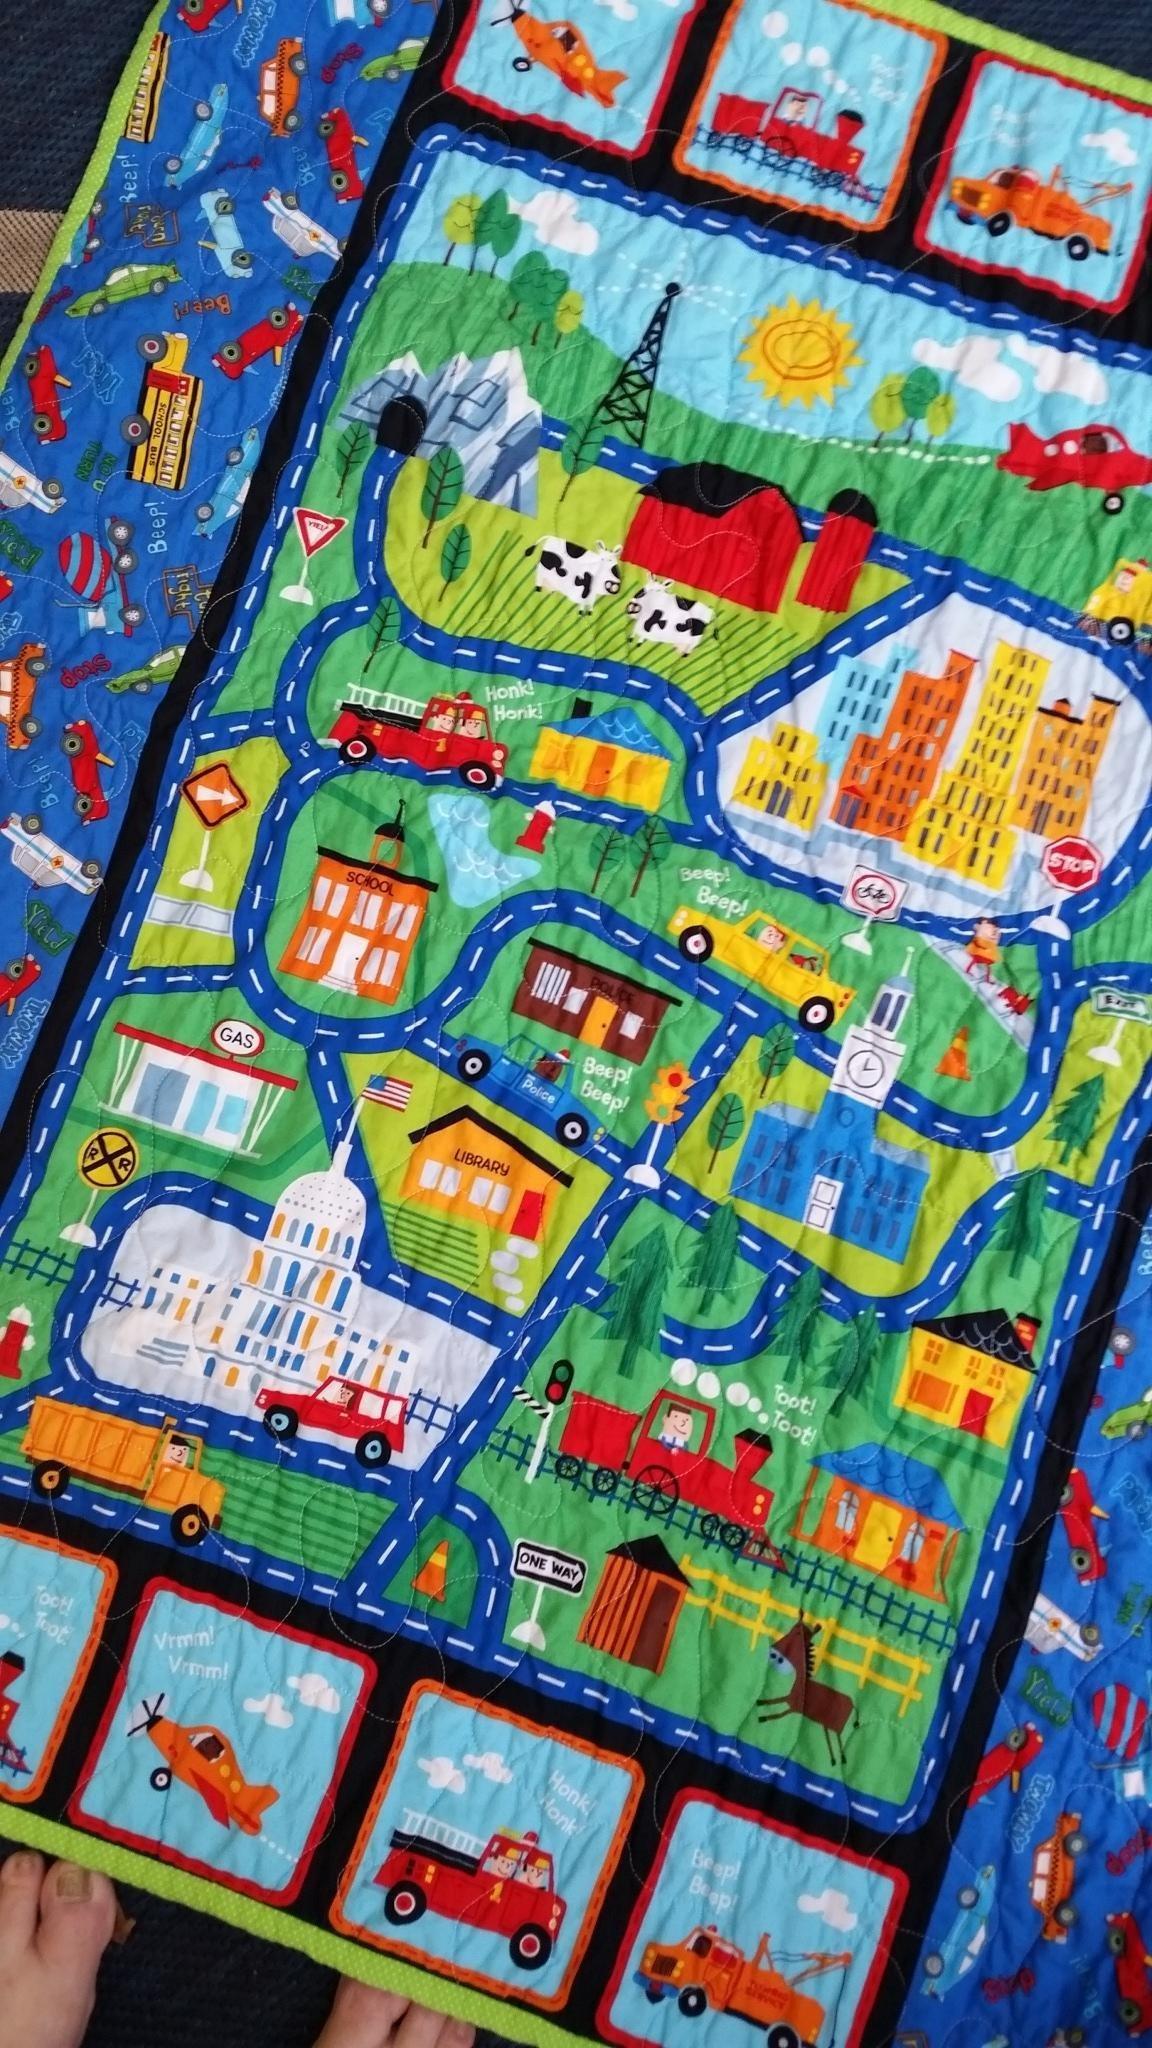 Cars and Trucks Quilt, Trucks and Cars Playmat, Trucks Crib Quilt, Vehicle Nursery, Vehicle Crib, Transportation Crib, Boy Crib Bedding, Airplane, Train, Vehicles, Car Toddler Birthday Present